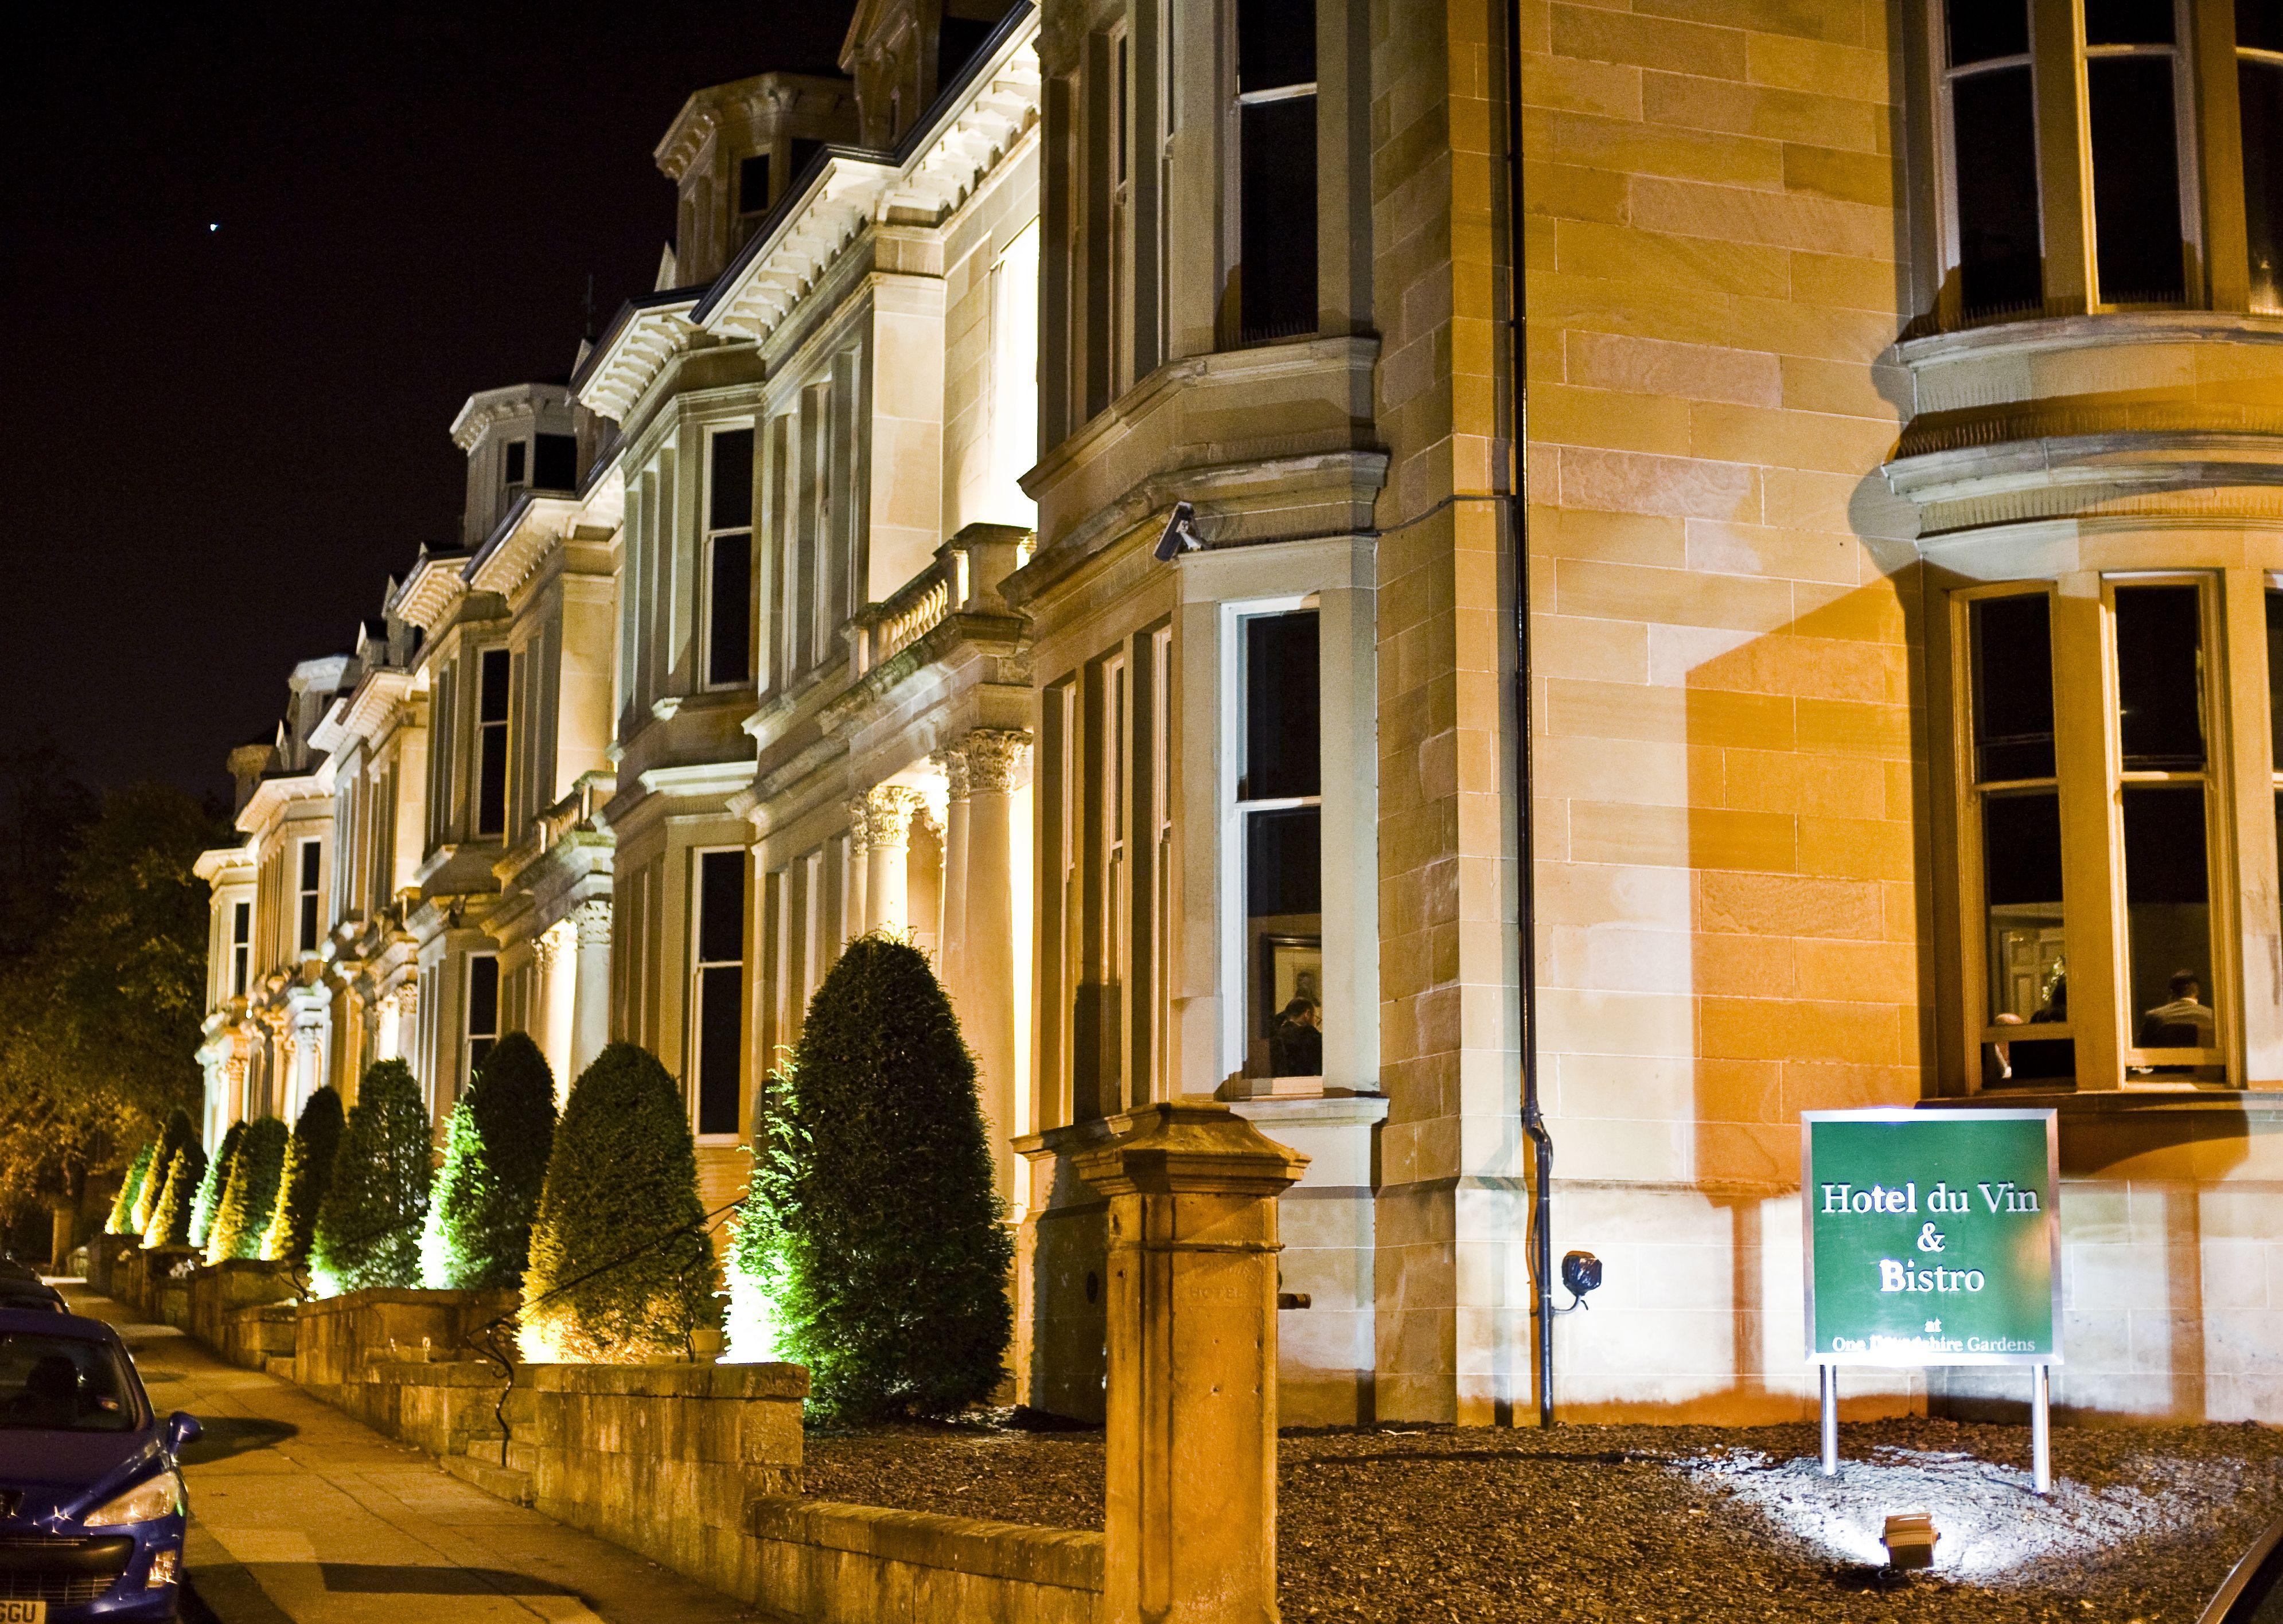 Hotel Du Vin, Glasgow at night | Glasgow | Pinterest | Loch lomond